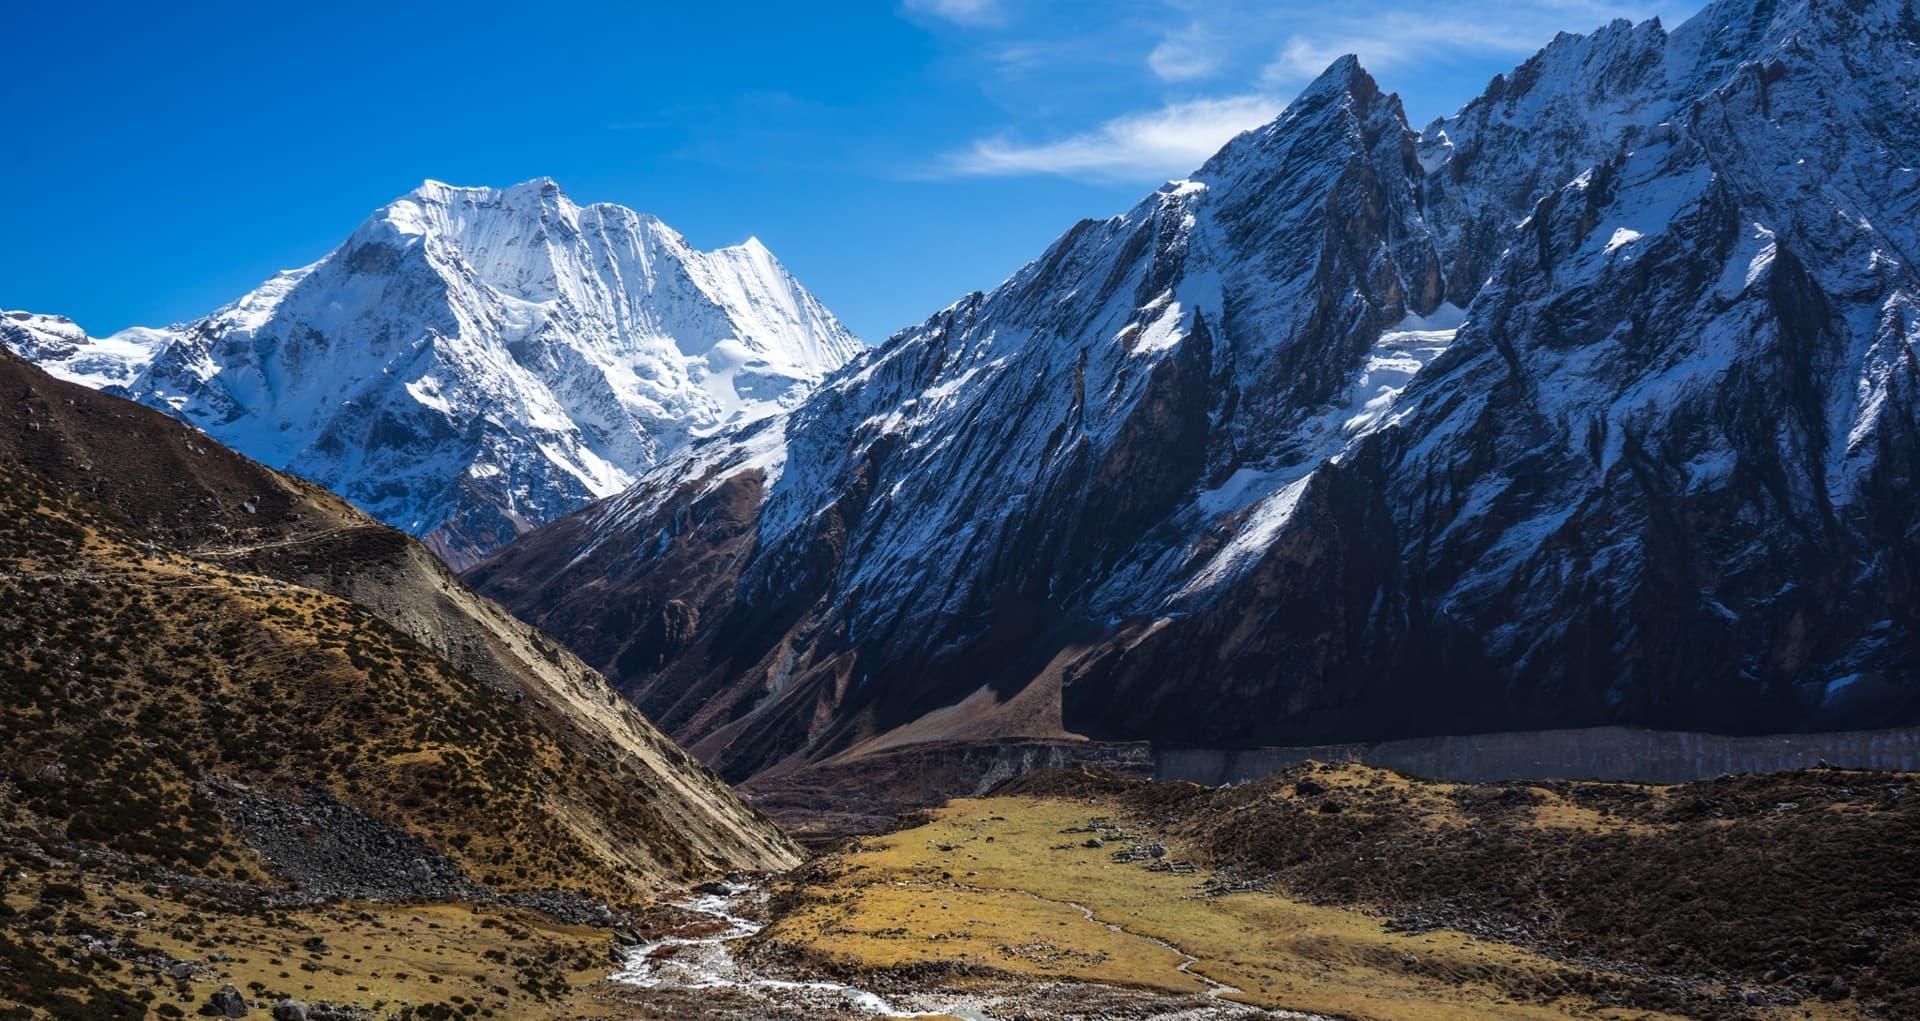 Vista del trekking del manaslu.